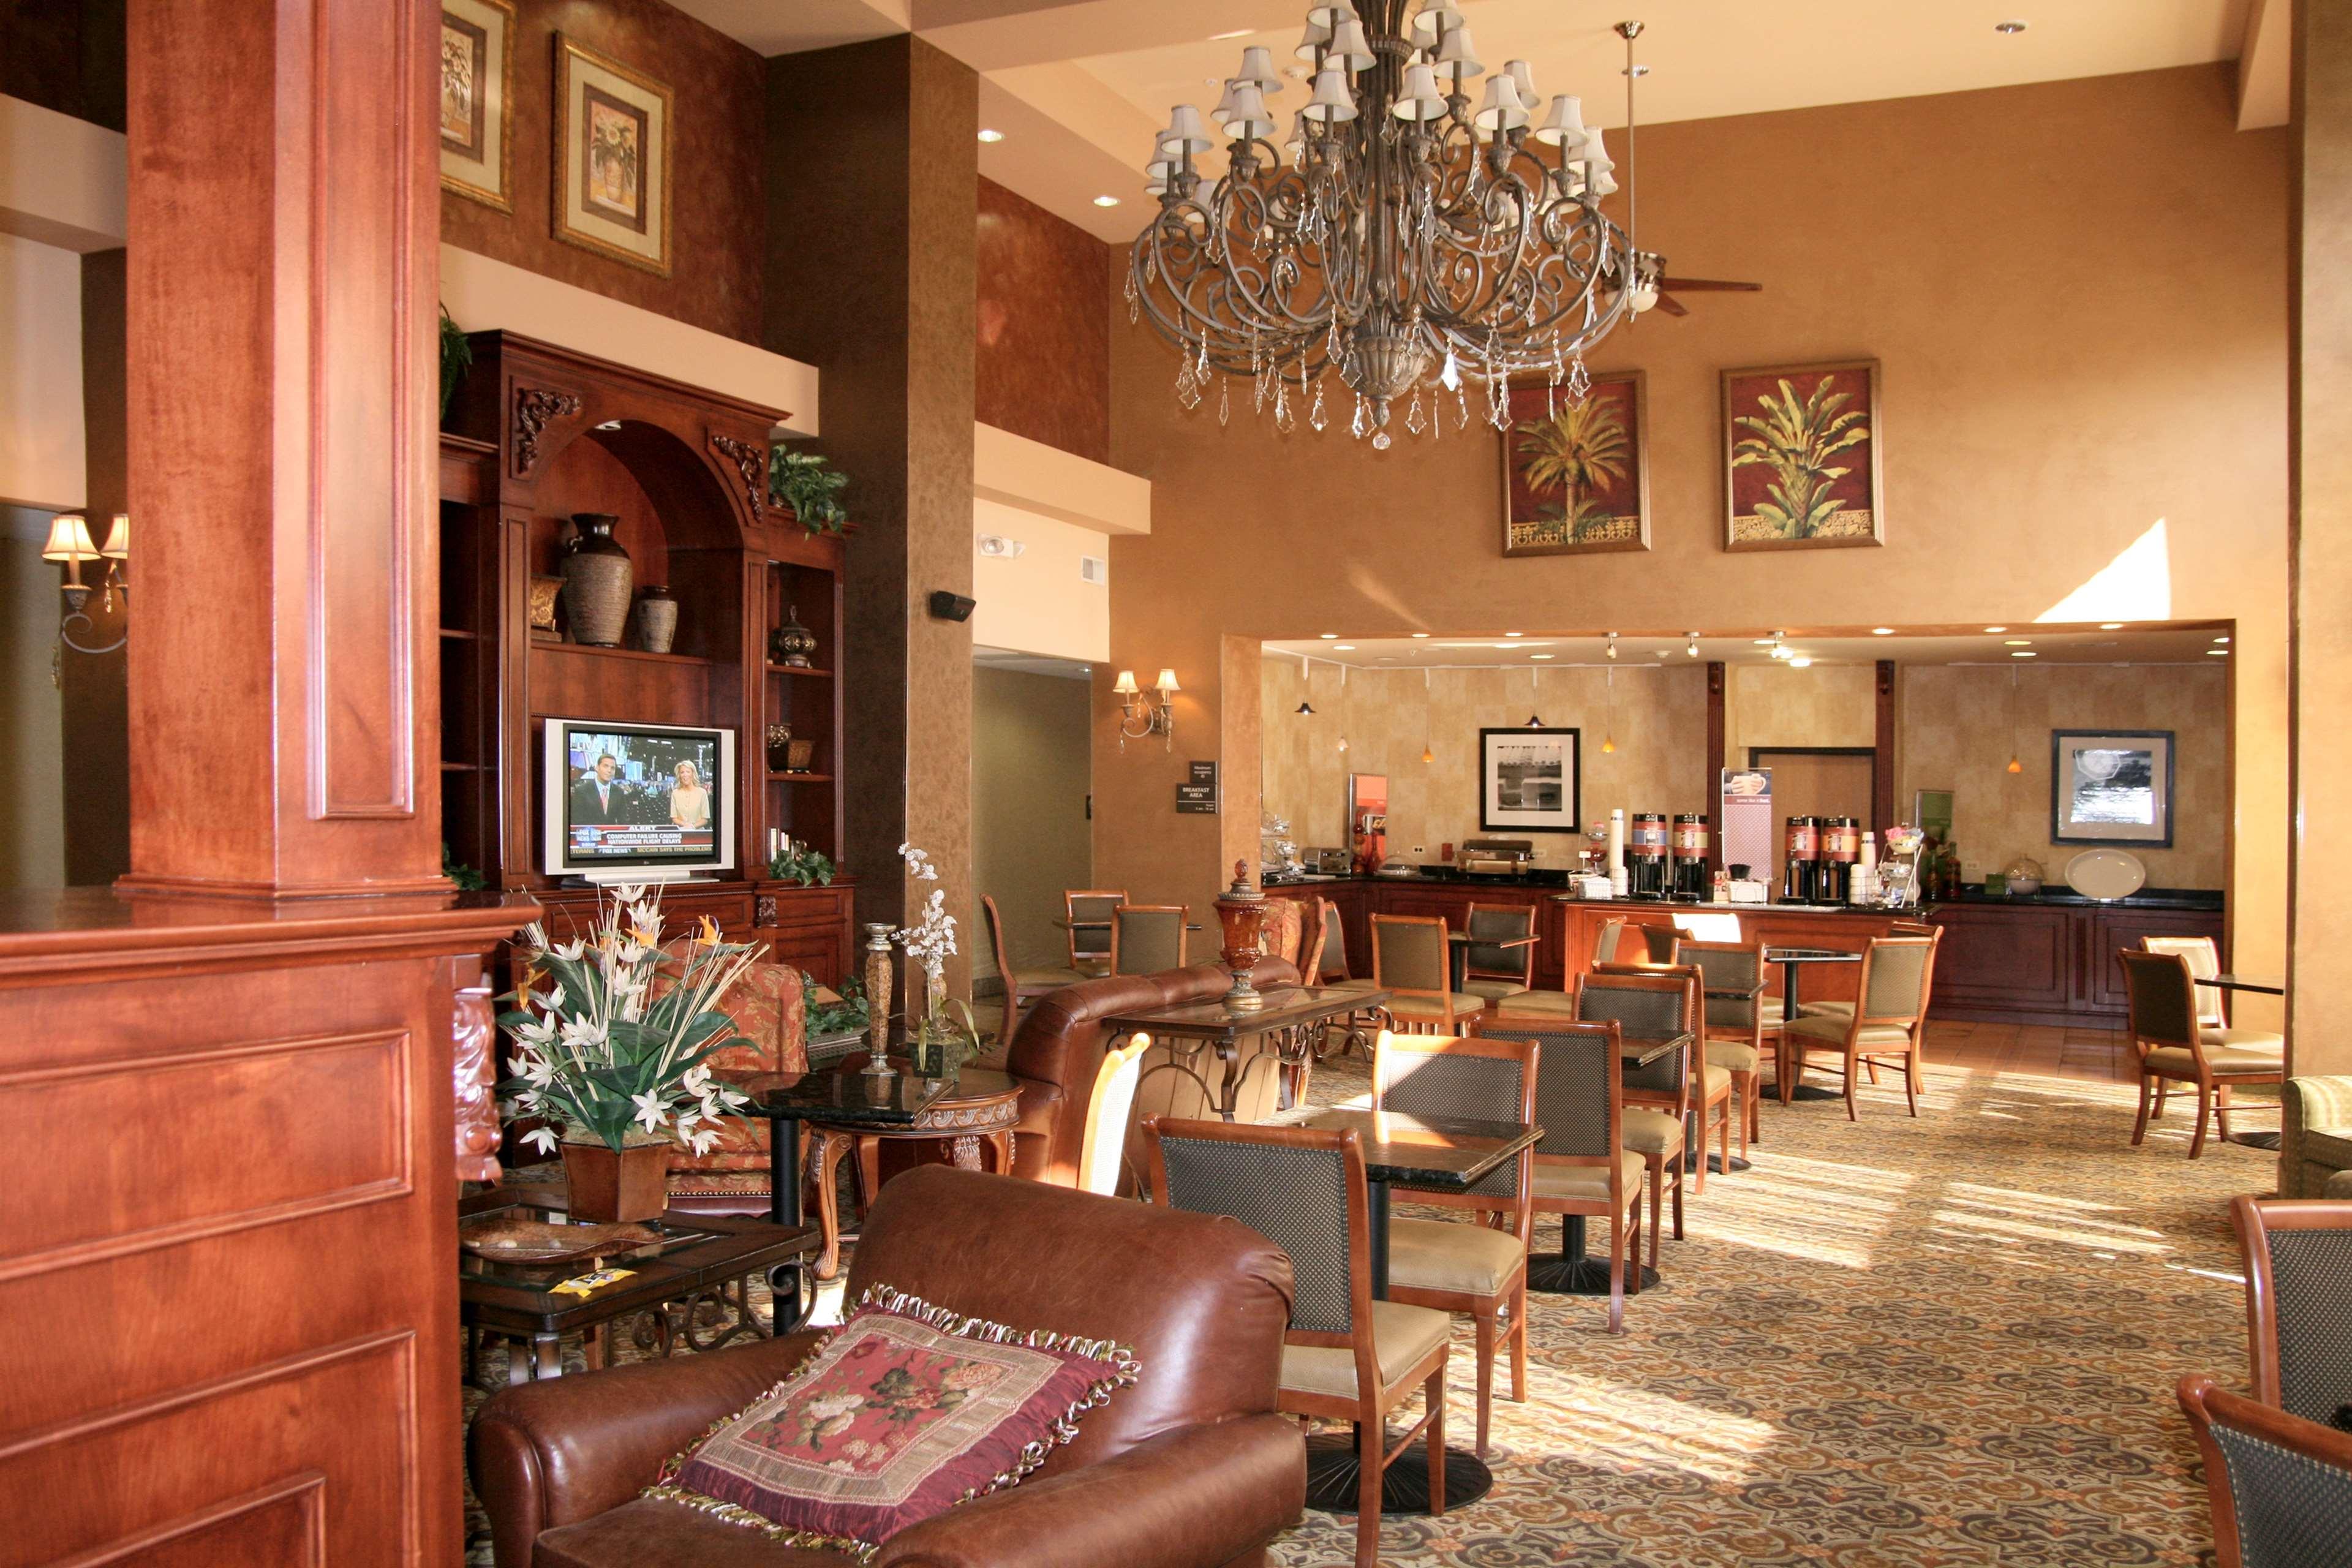 Hampton Inn & Suites Bolingbrook image 4